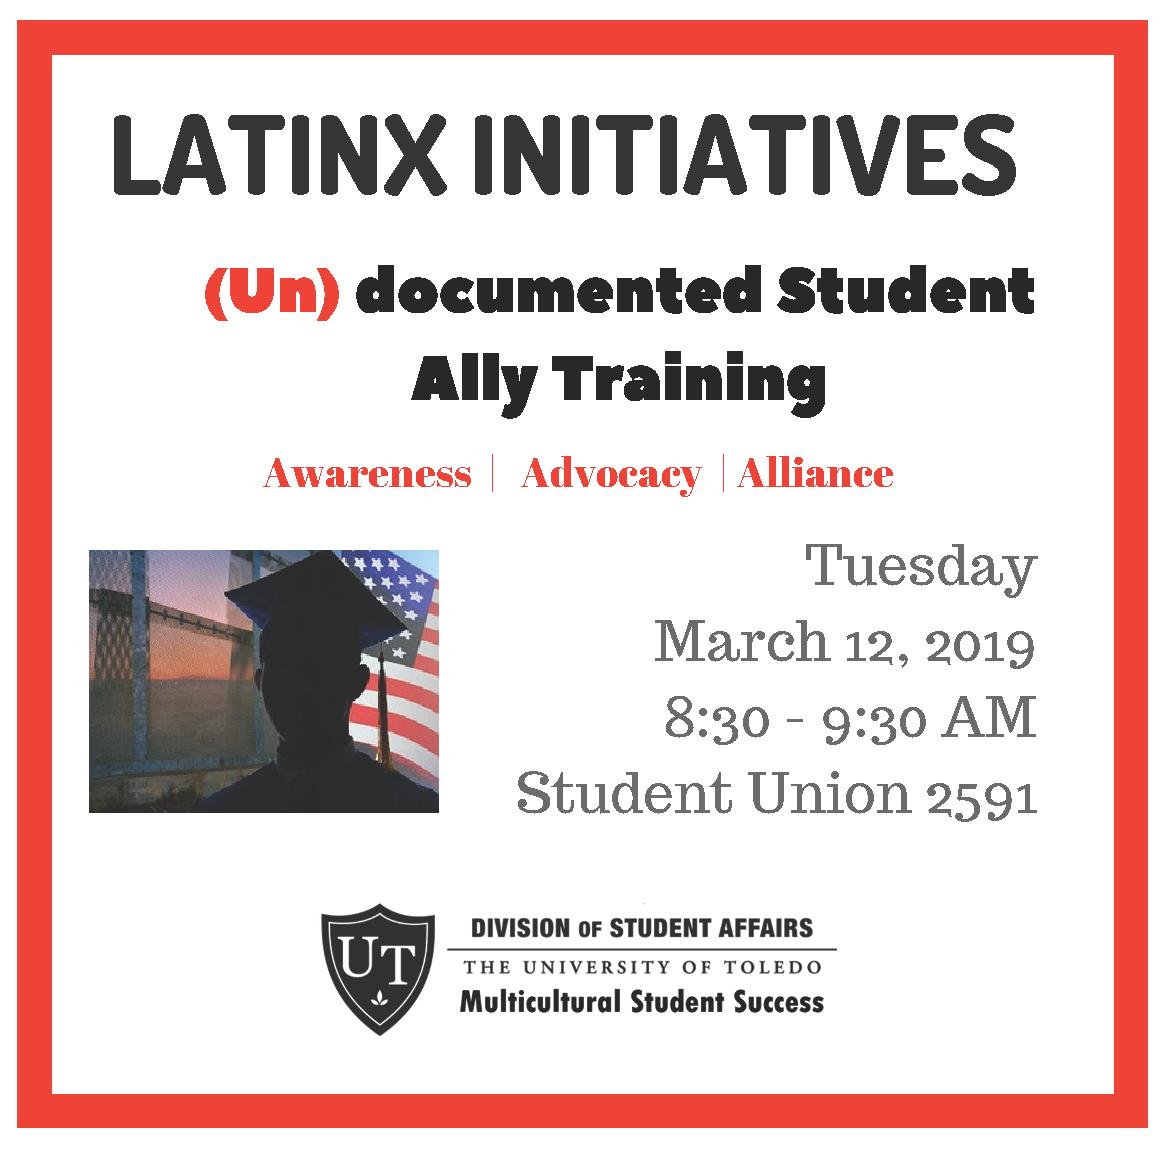 Flyer for PSA professional development workshop: Latinx Initiatives (Un)documented Student Ally Training